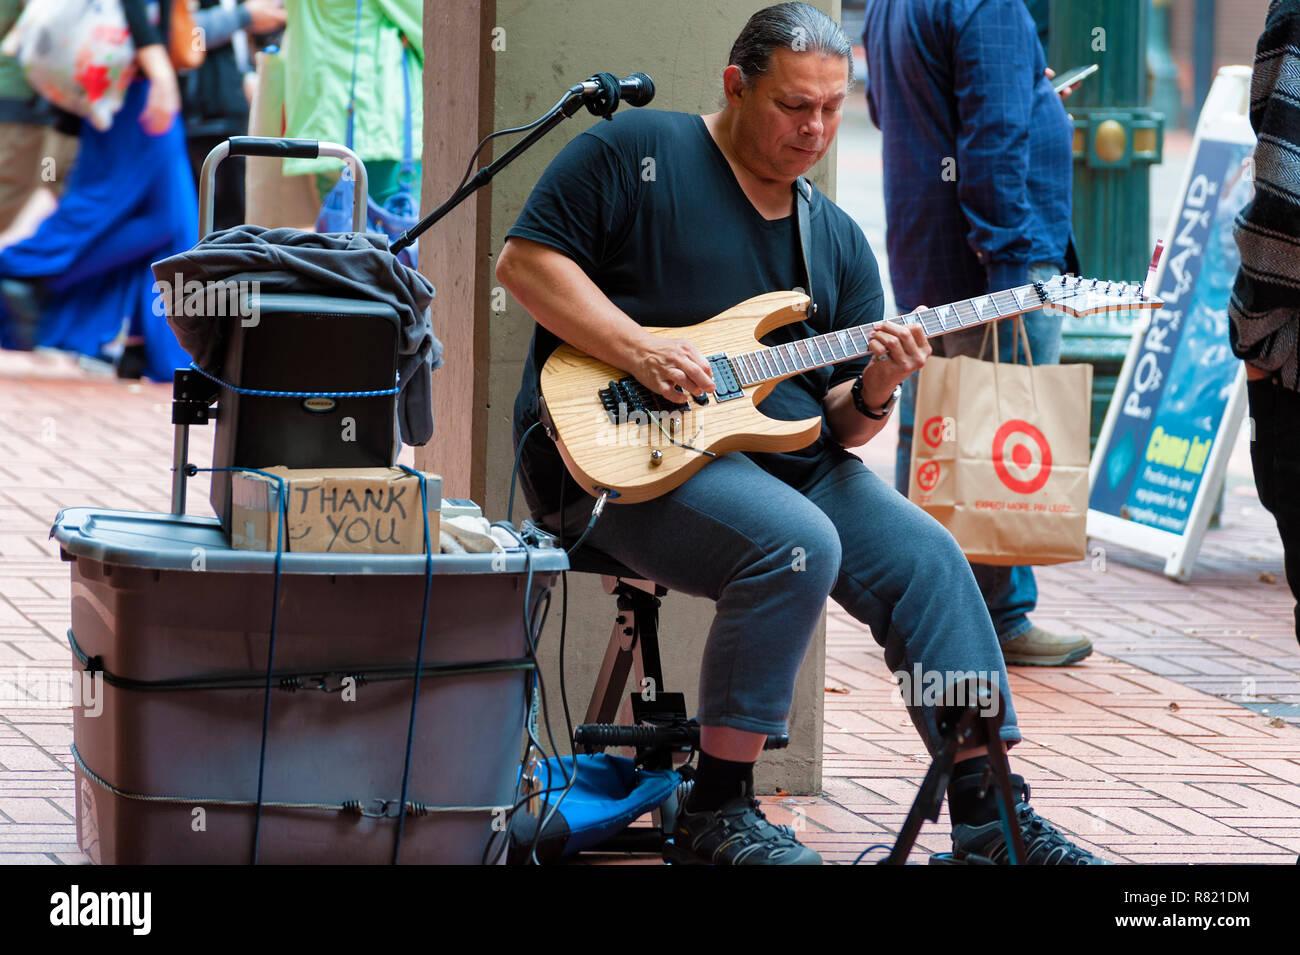 Portland, Oregon,USA - October 8, 2016: A street performer plays an electric guitar in downtown Portland, Oregon Stock Photo